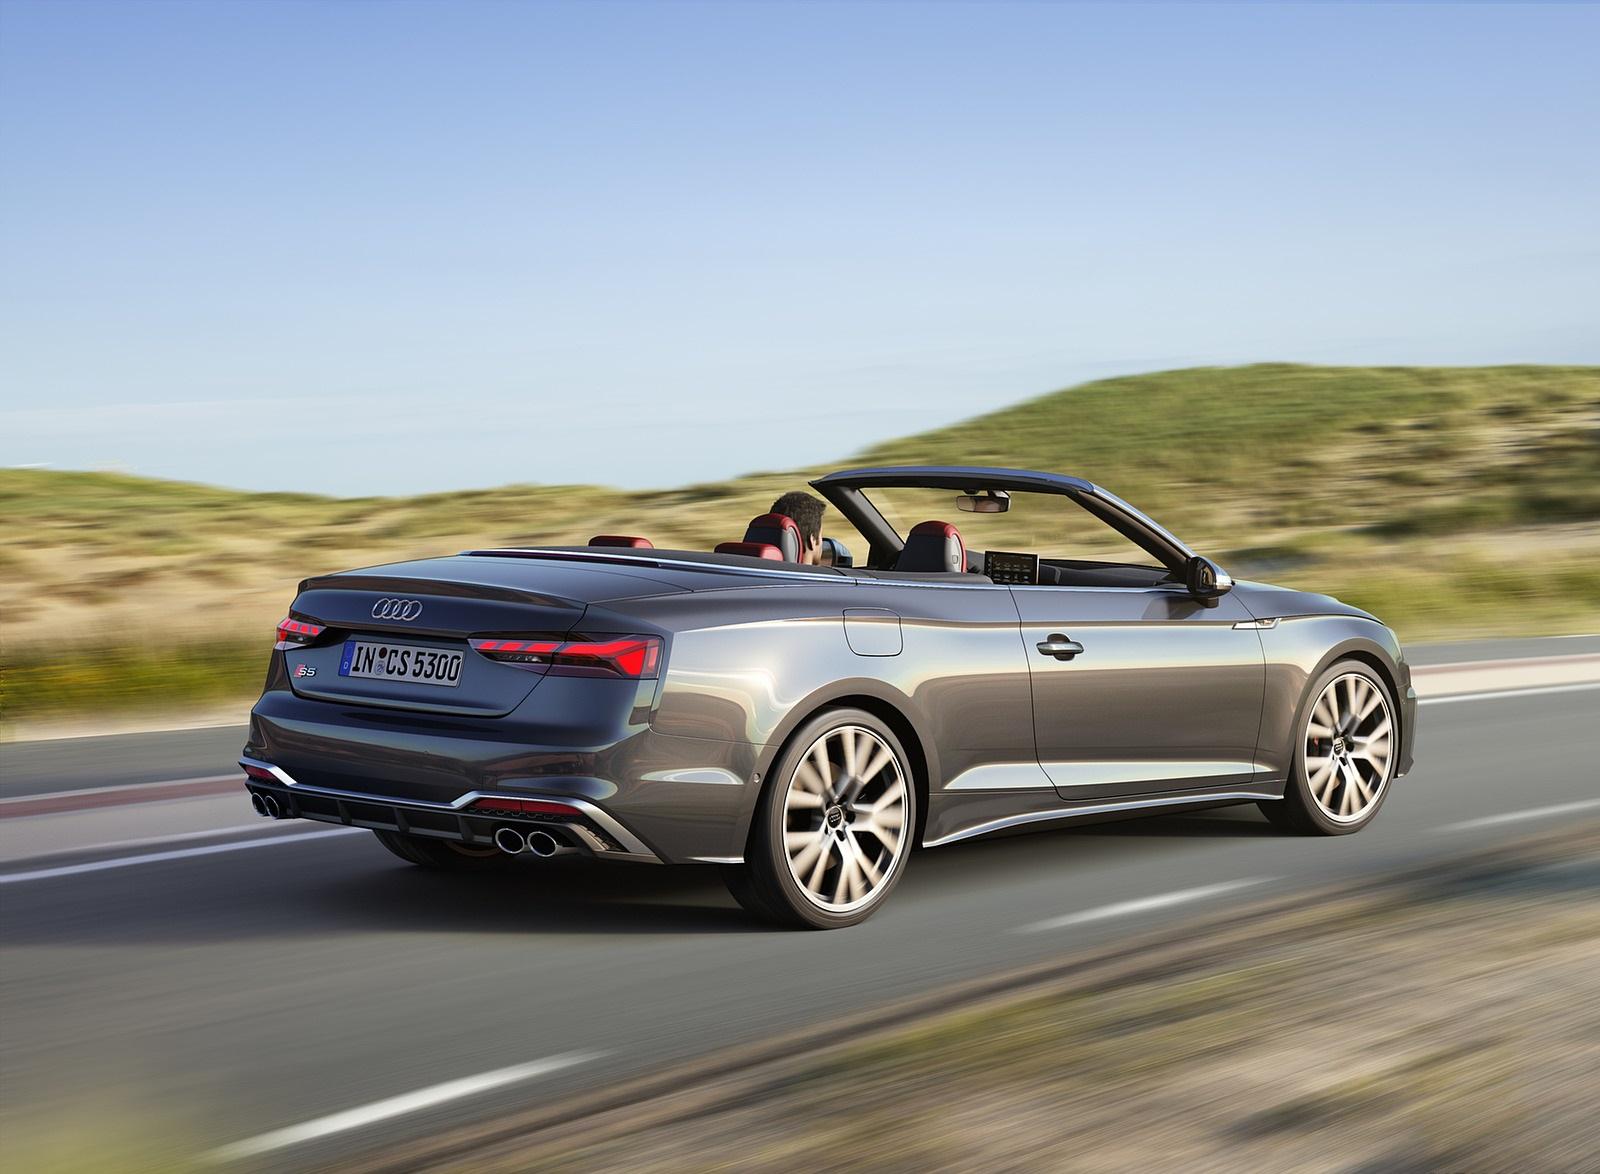 2021 Audi S5 Cabriolet (Color: Daytona Gray) Rear Three-Quarter Wallpapers (3)